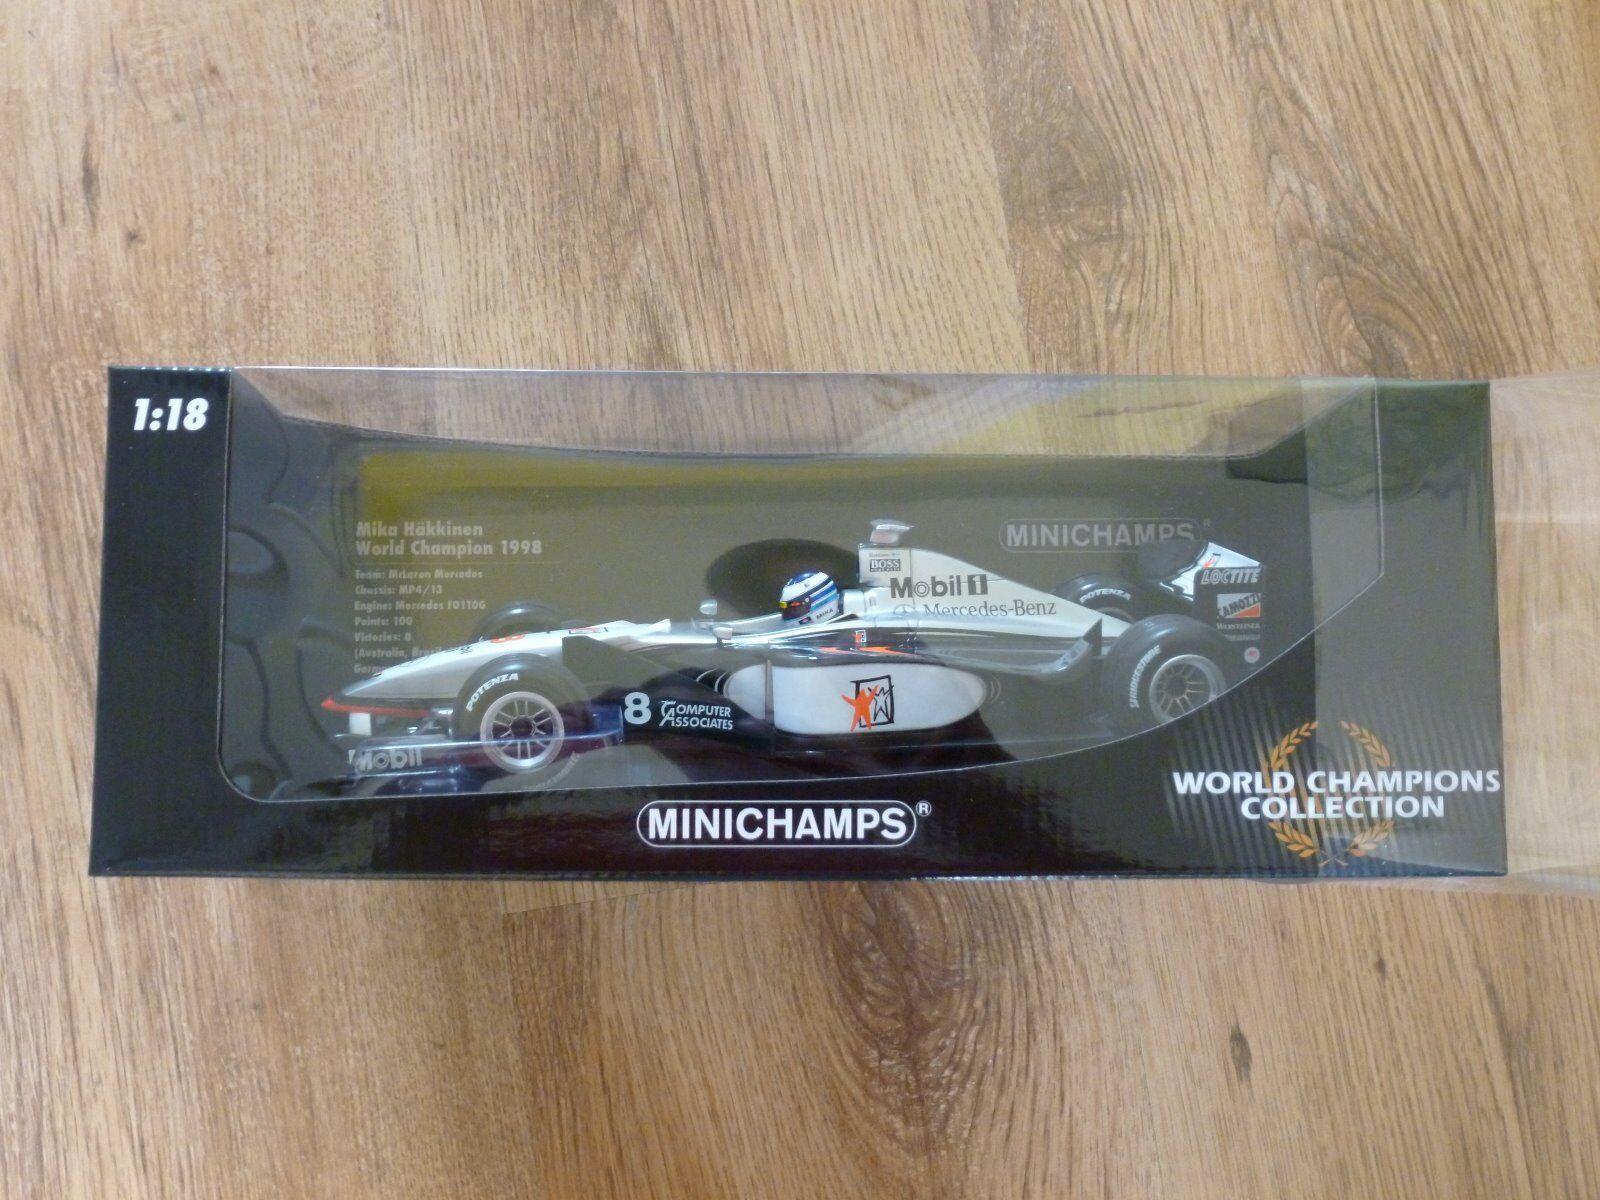 MINICHAMPS 18th McLaren MP4 13 Hakkinen World Champion 98